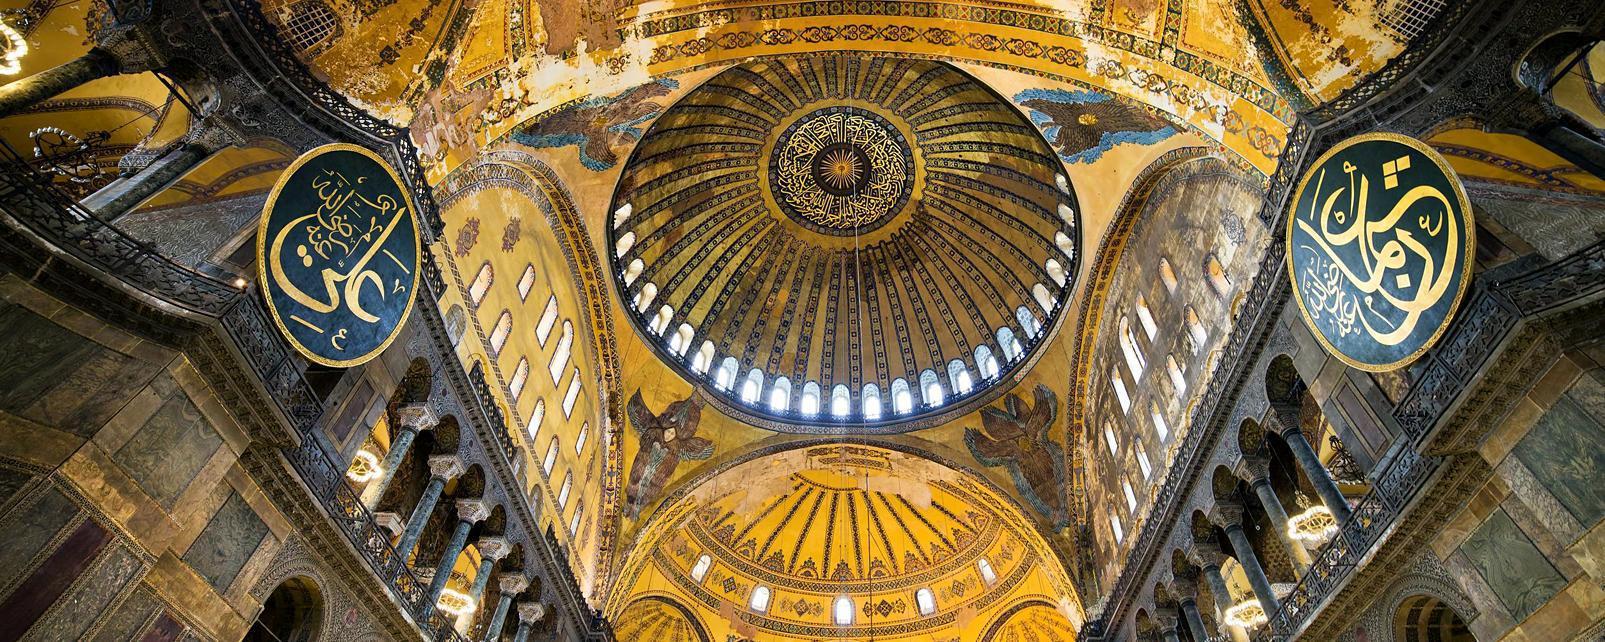 Asie, Europe, Moyen-Orient, Turquie, Istanbul, Hagia Sofia, Sainte-Sophie, Ayasofya, basilique, ornement, plafond, religion,